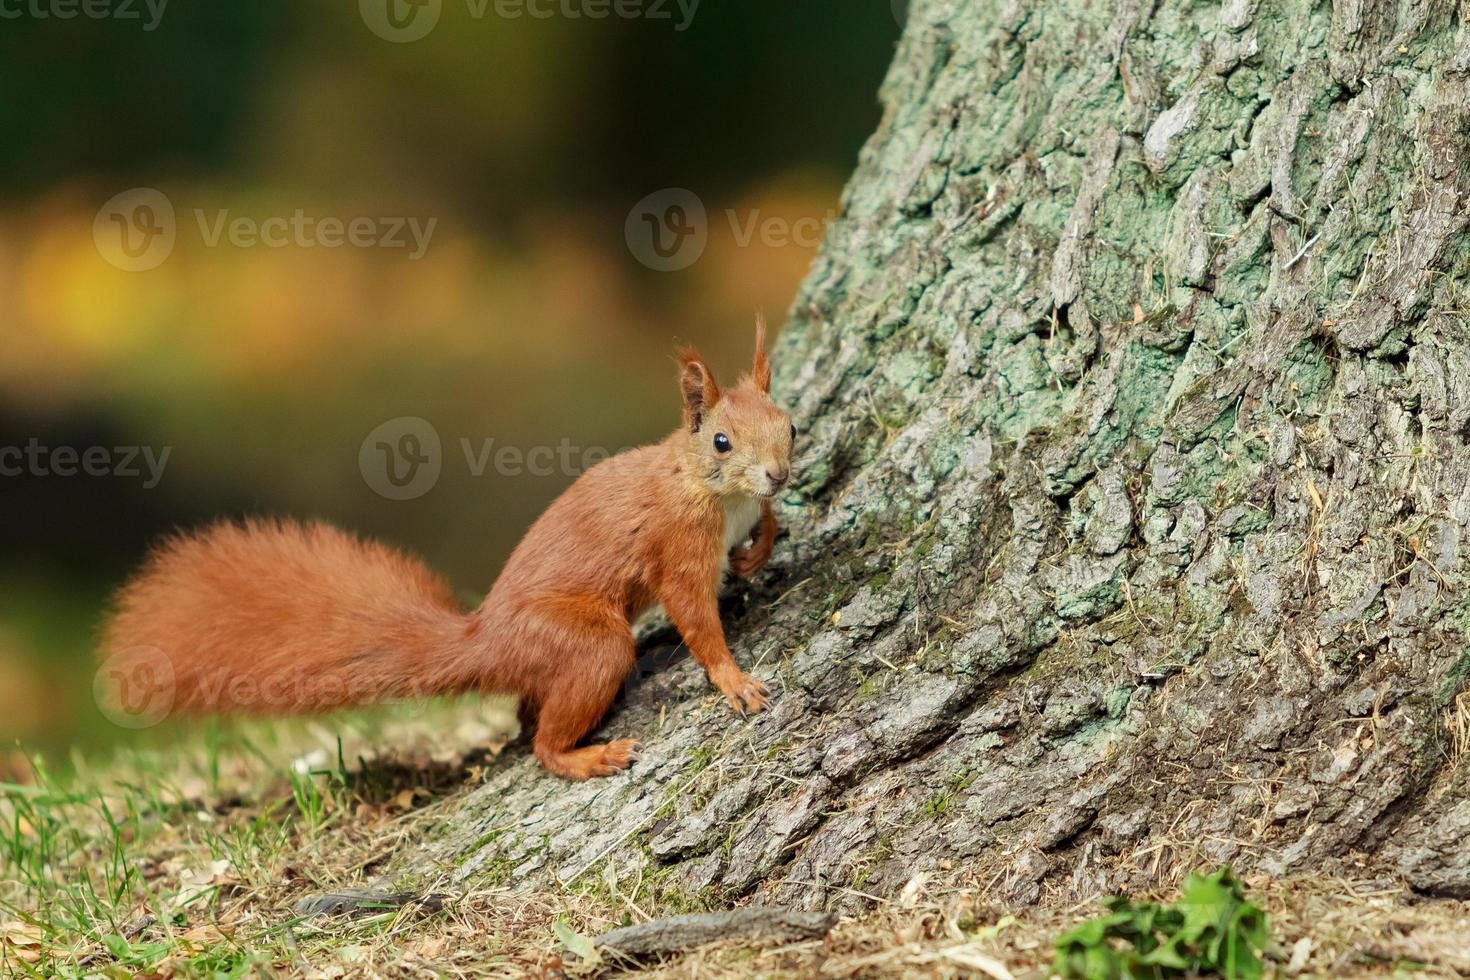 bruine eekhoorn op boom. foto